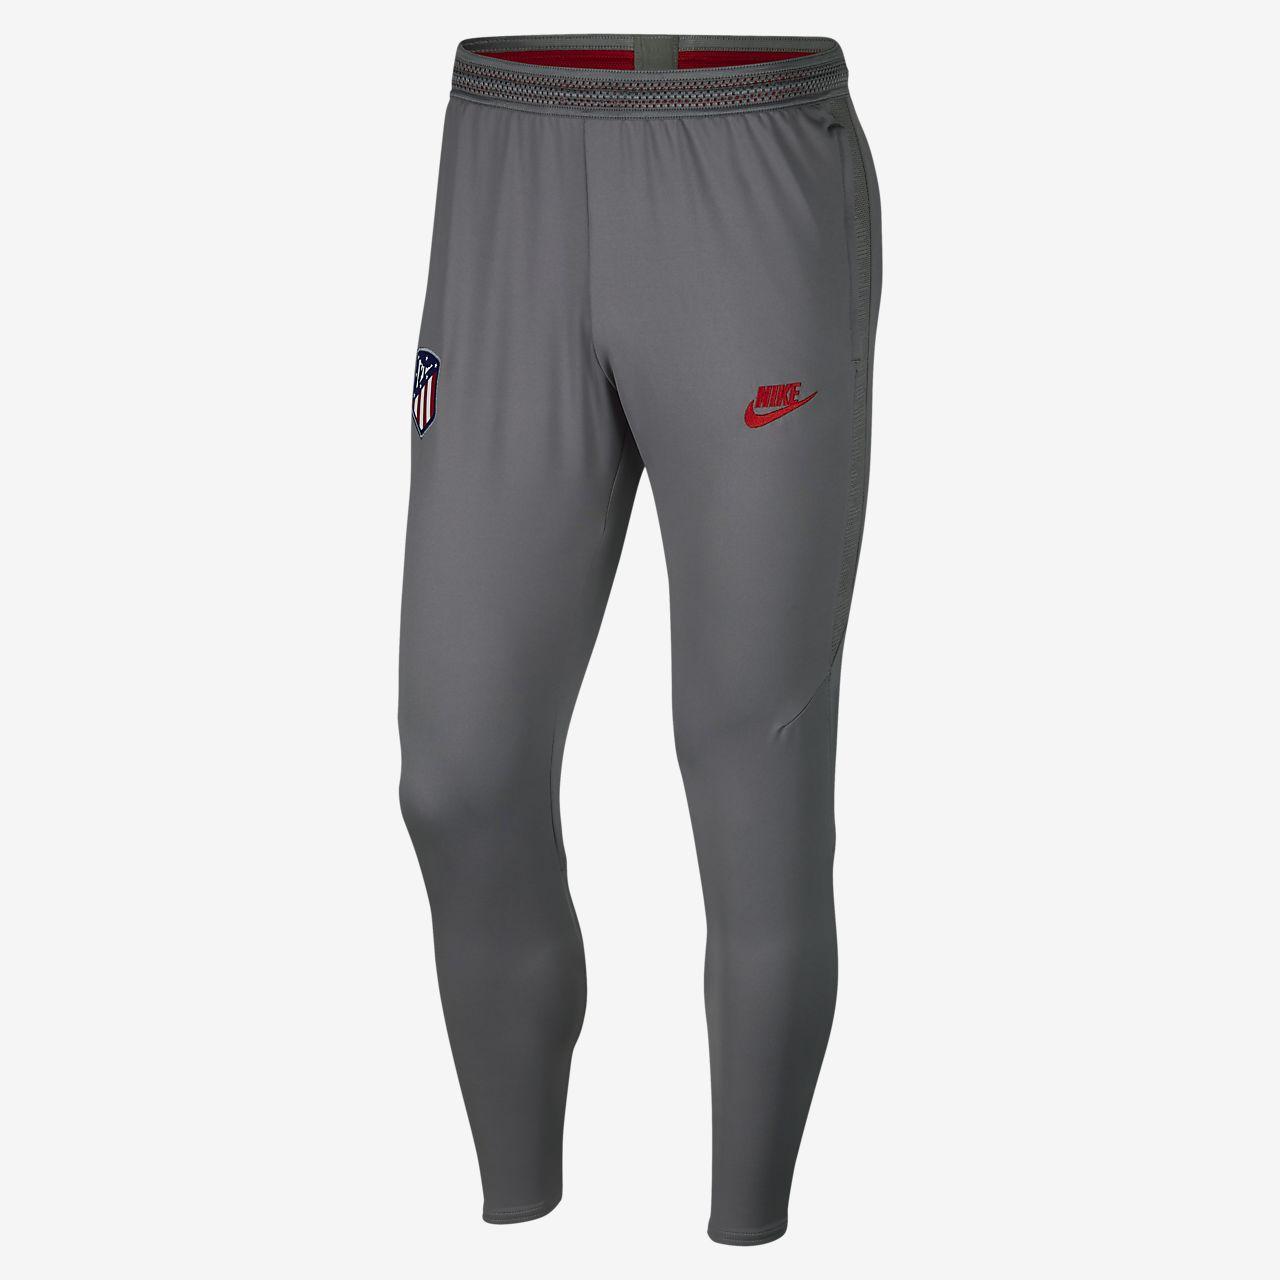 Pantalon de football Nike Dri-FIT Atletico de Madrid Strike pour Homme